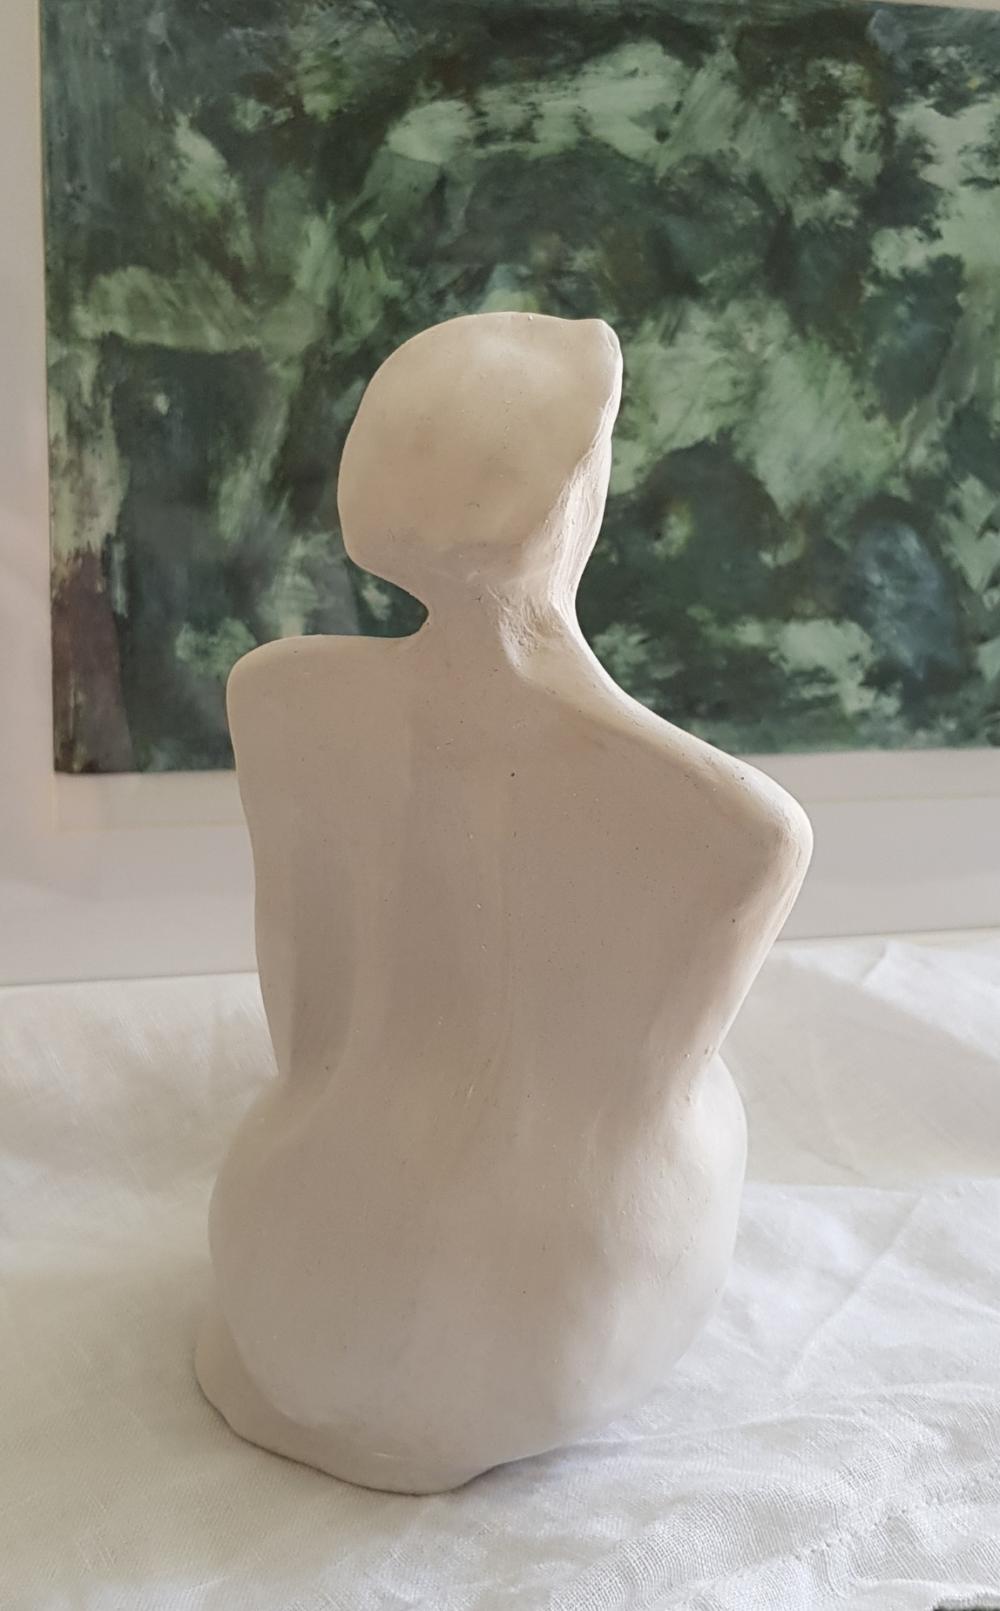 perception sylvie Antoniotti galerie bel'arti